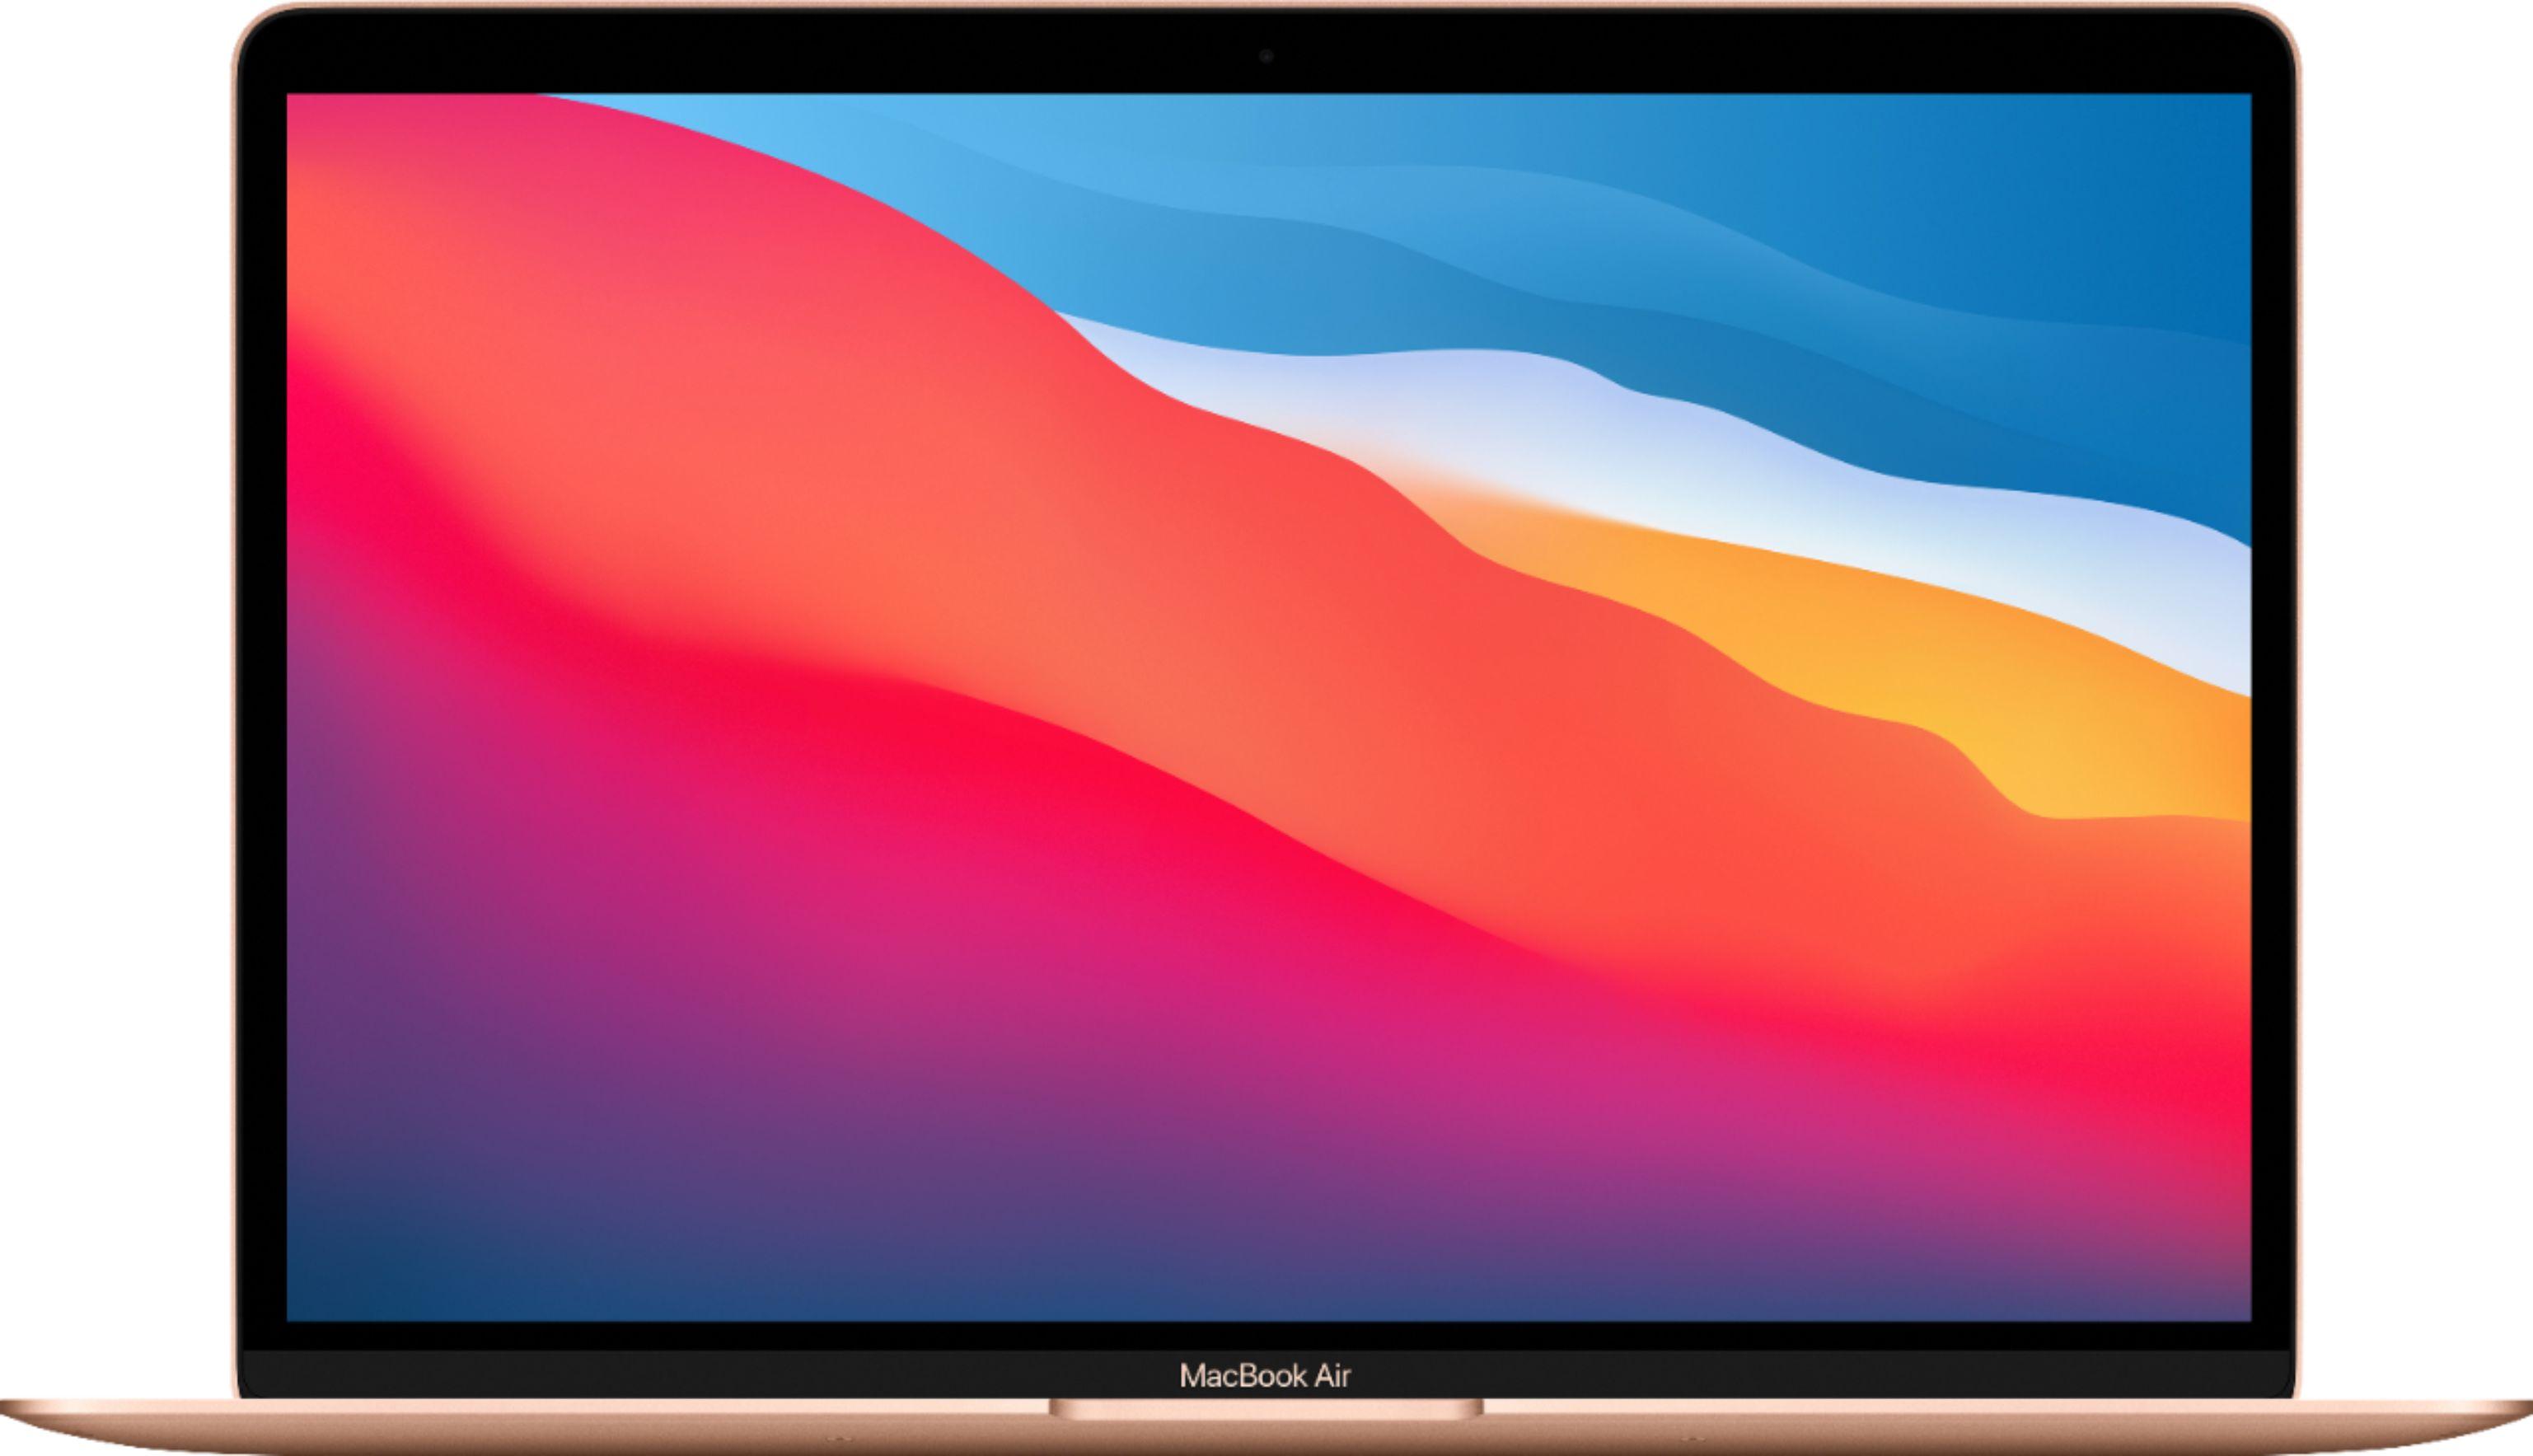 "MacBook Air 13.3"" Apple M1 chip 8GB RAM 256GB SSD $899"